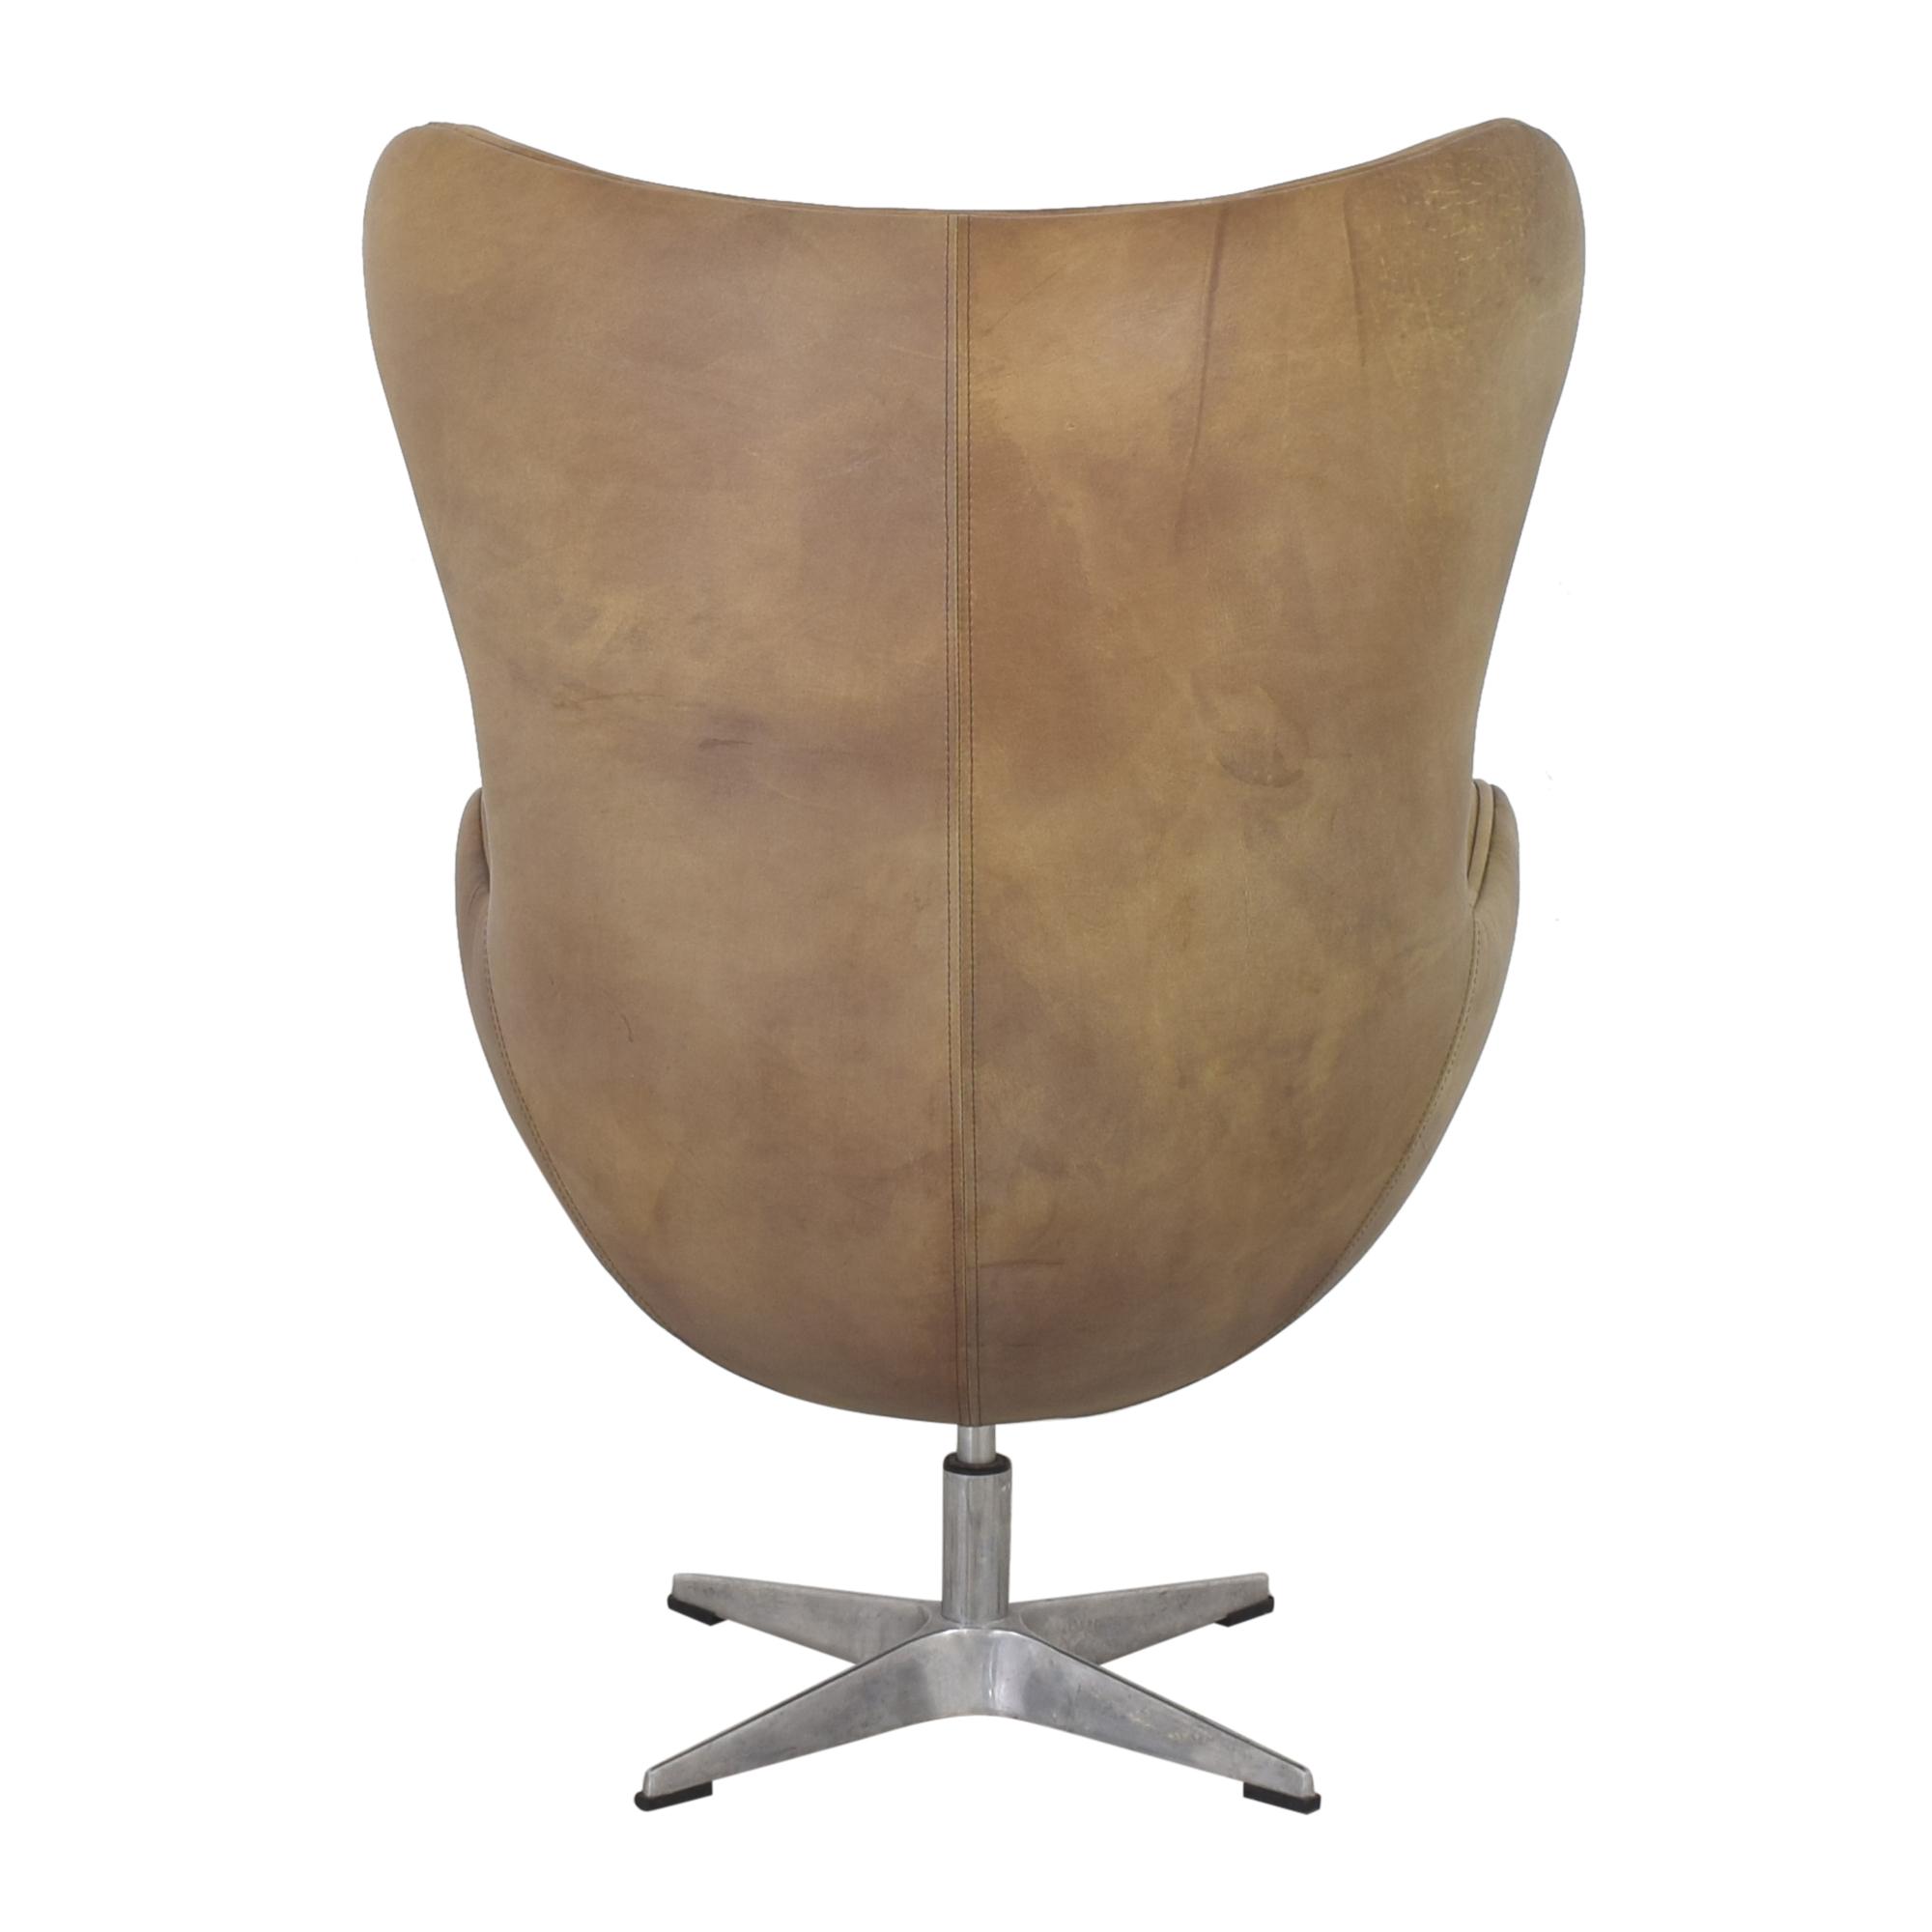 Restoration Hardware Restoration Hardware 1950s Copenhagen Chair discount